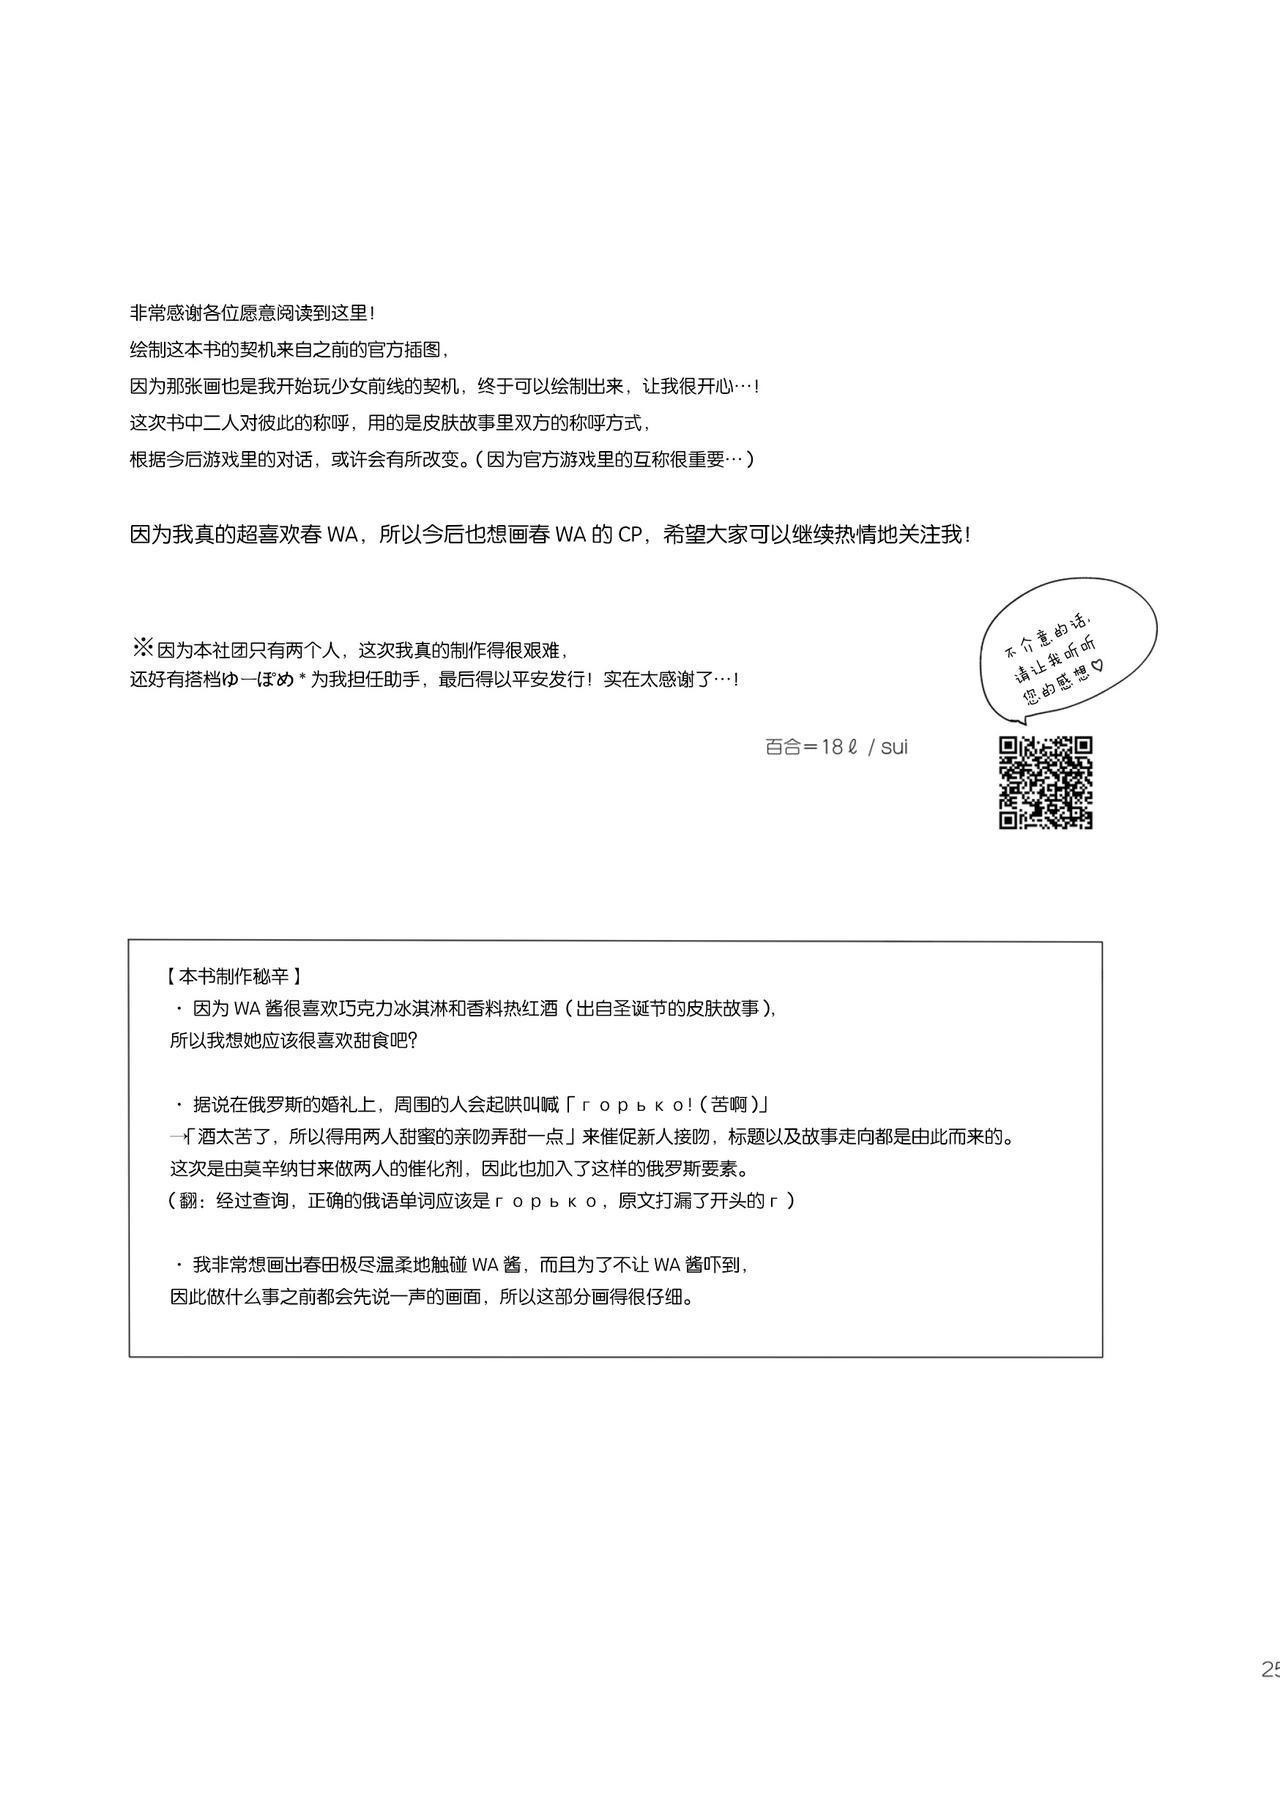 [(Yuri=18L)sui] Alcohol wa Amai (Girls' Frontline) [Chinese]   酒精是甘甜滋味 (少女前線) [提黄灯喵汉化组] 23